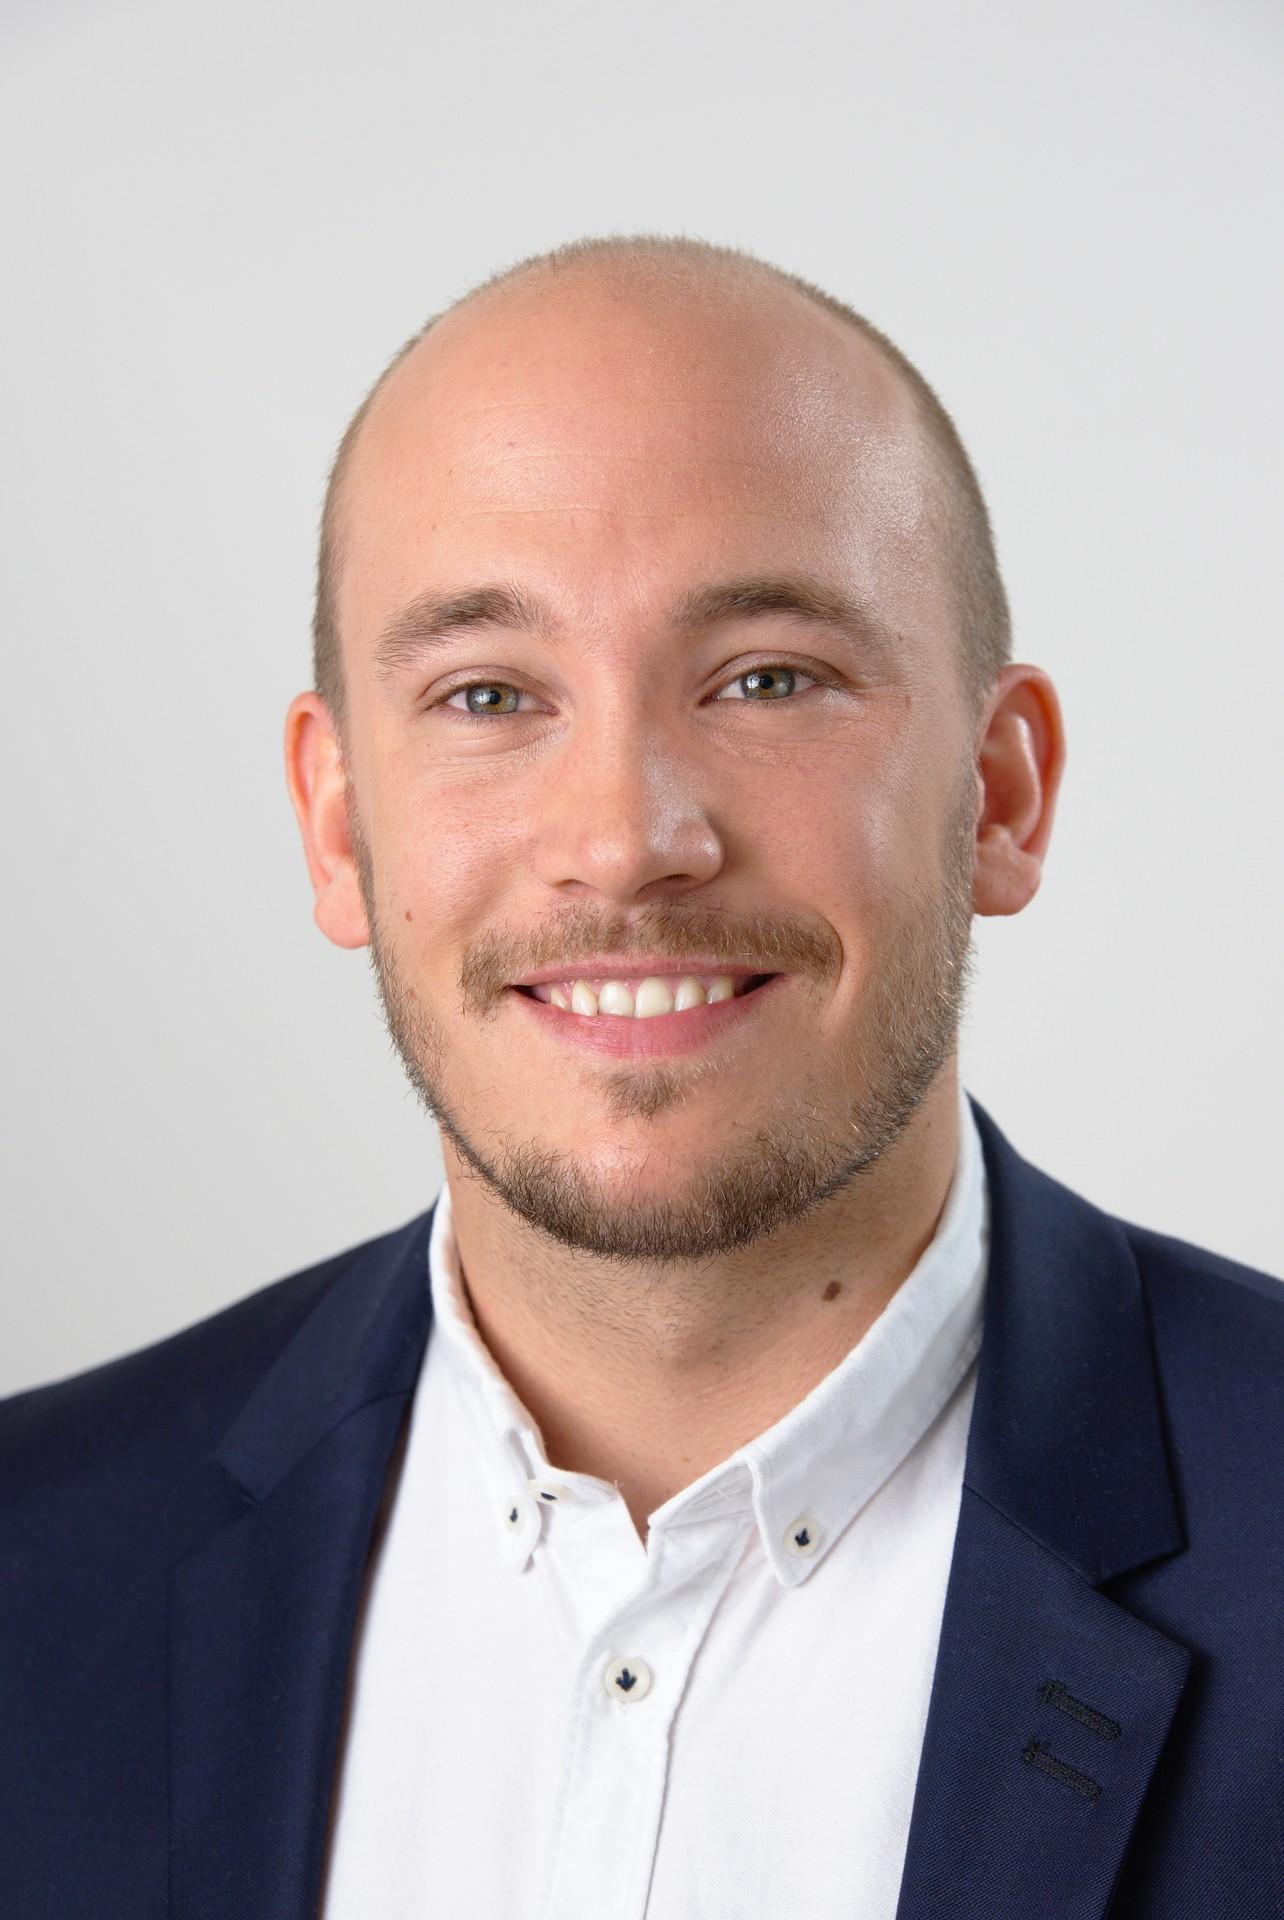 Hannes Oberortner, BSc